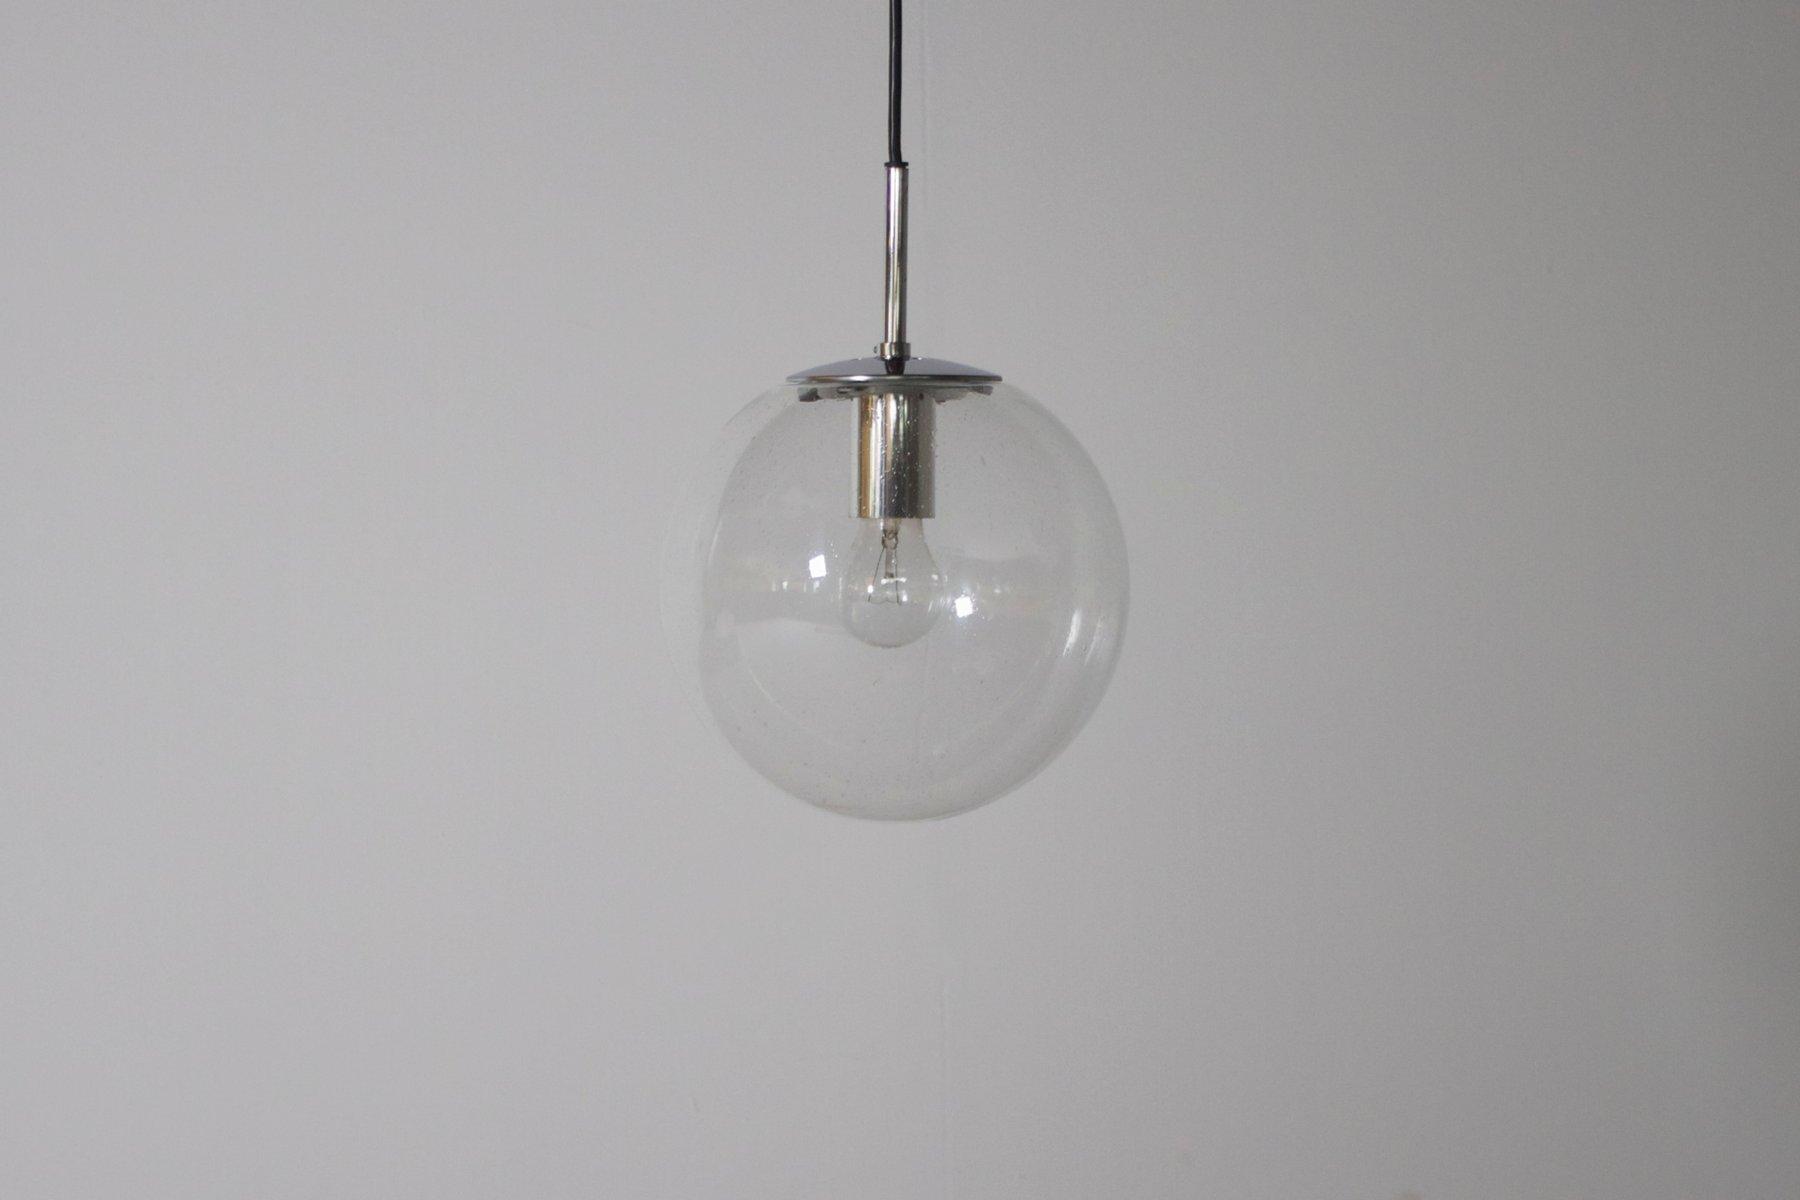 petite lampe suspension globe en verre de factory limburg allemagne en vente sur pamono. Black Bedroom Furniture Sets. Home Design Ideas